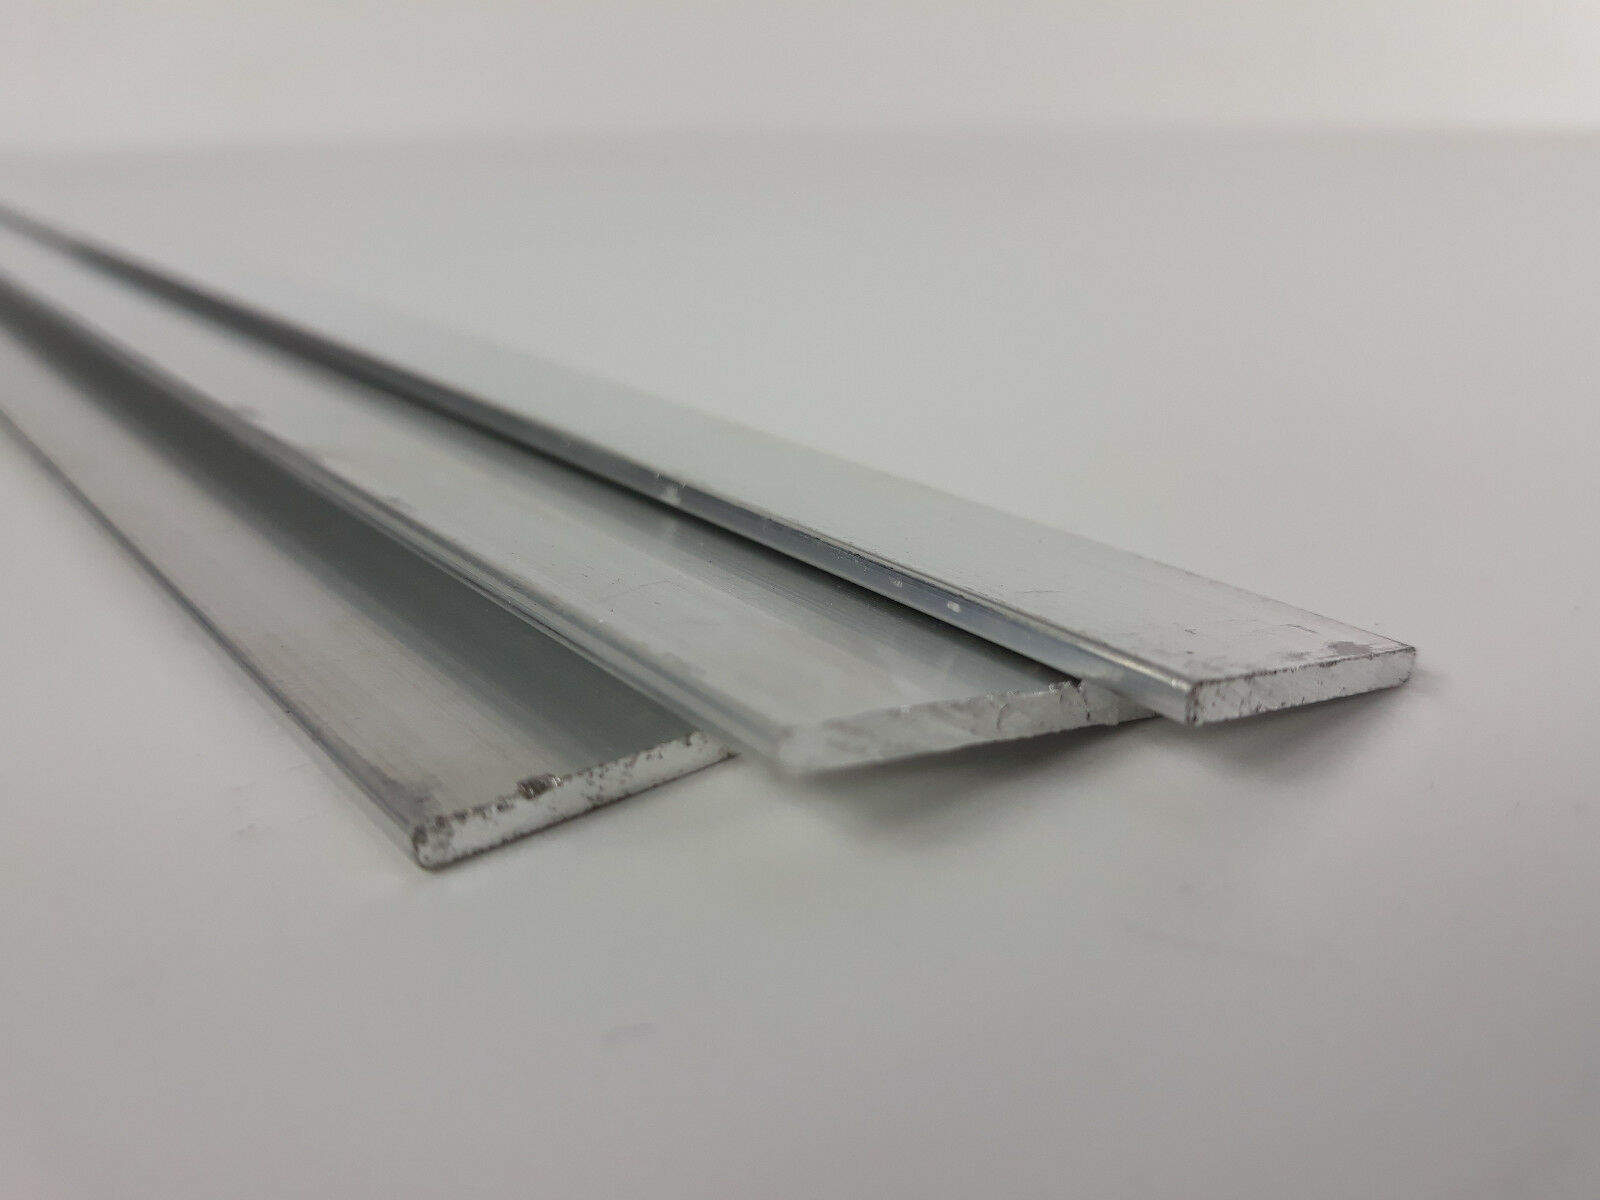 Alu Flachstange 10x2mm Aluprofil Aluminium Stange 1m